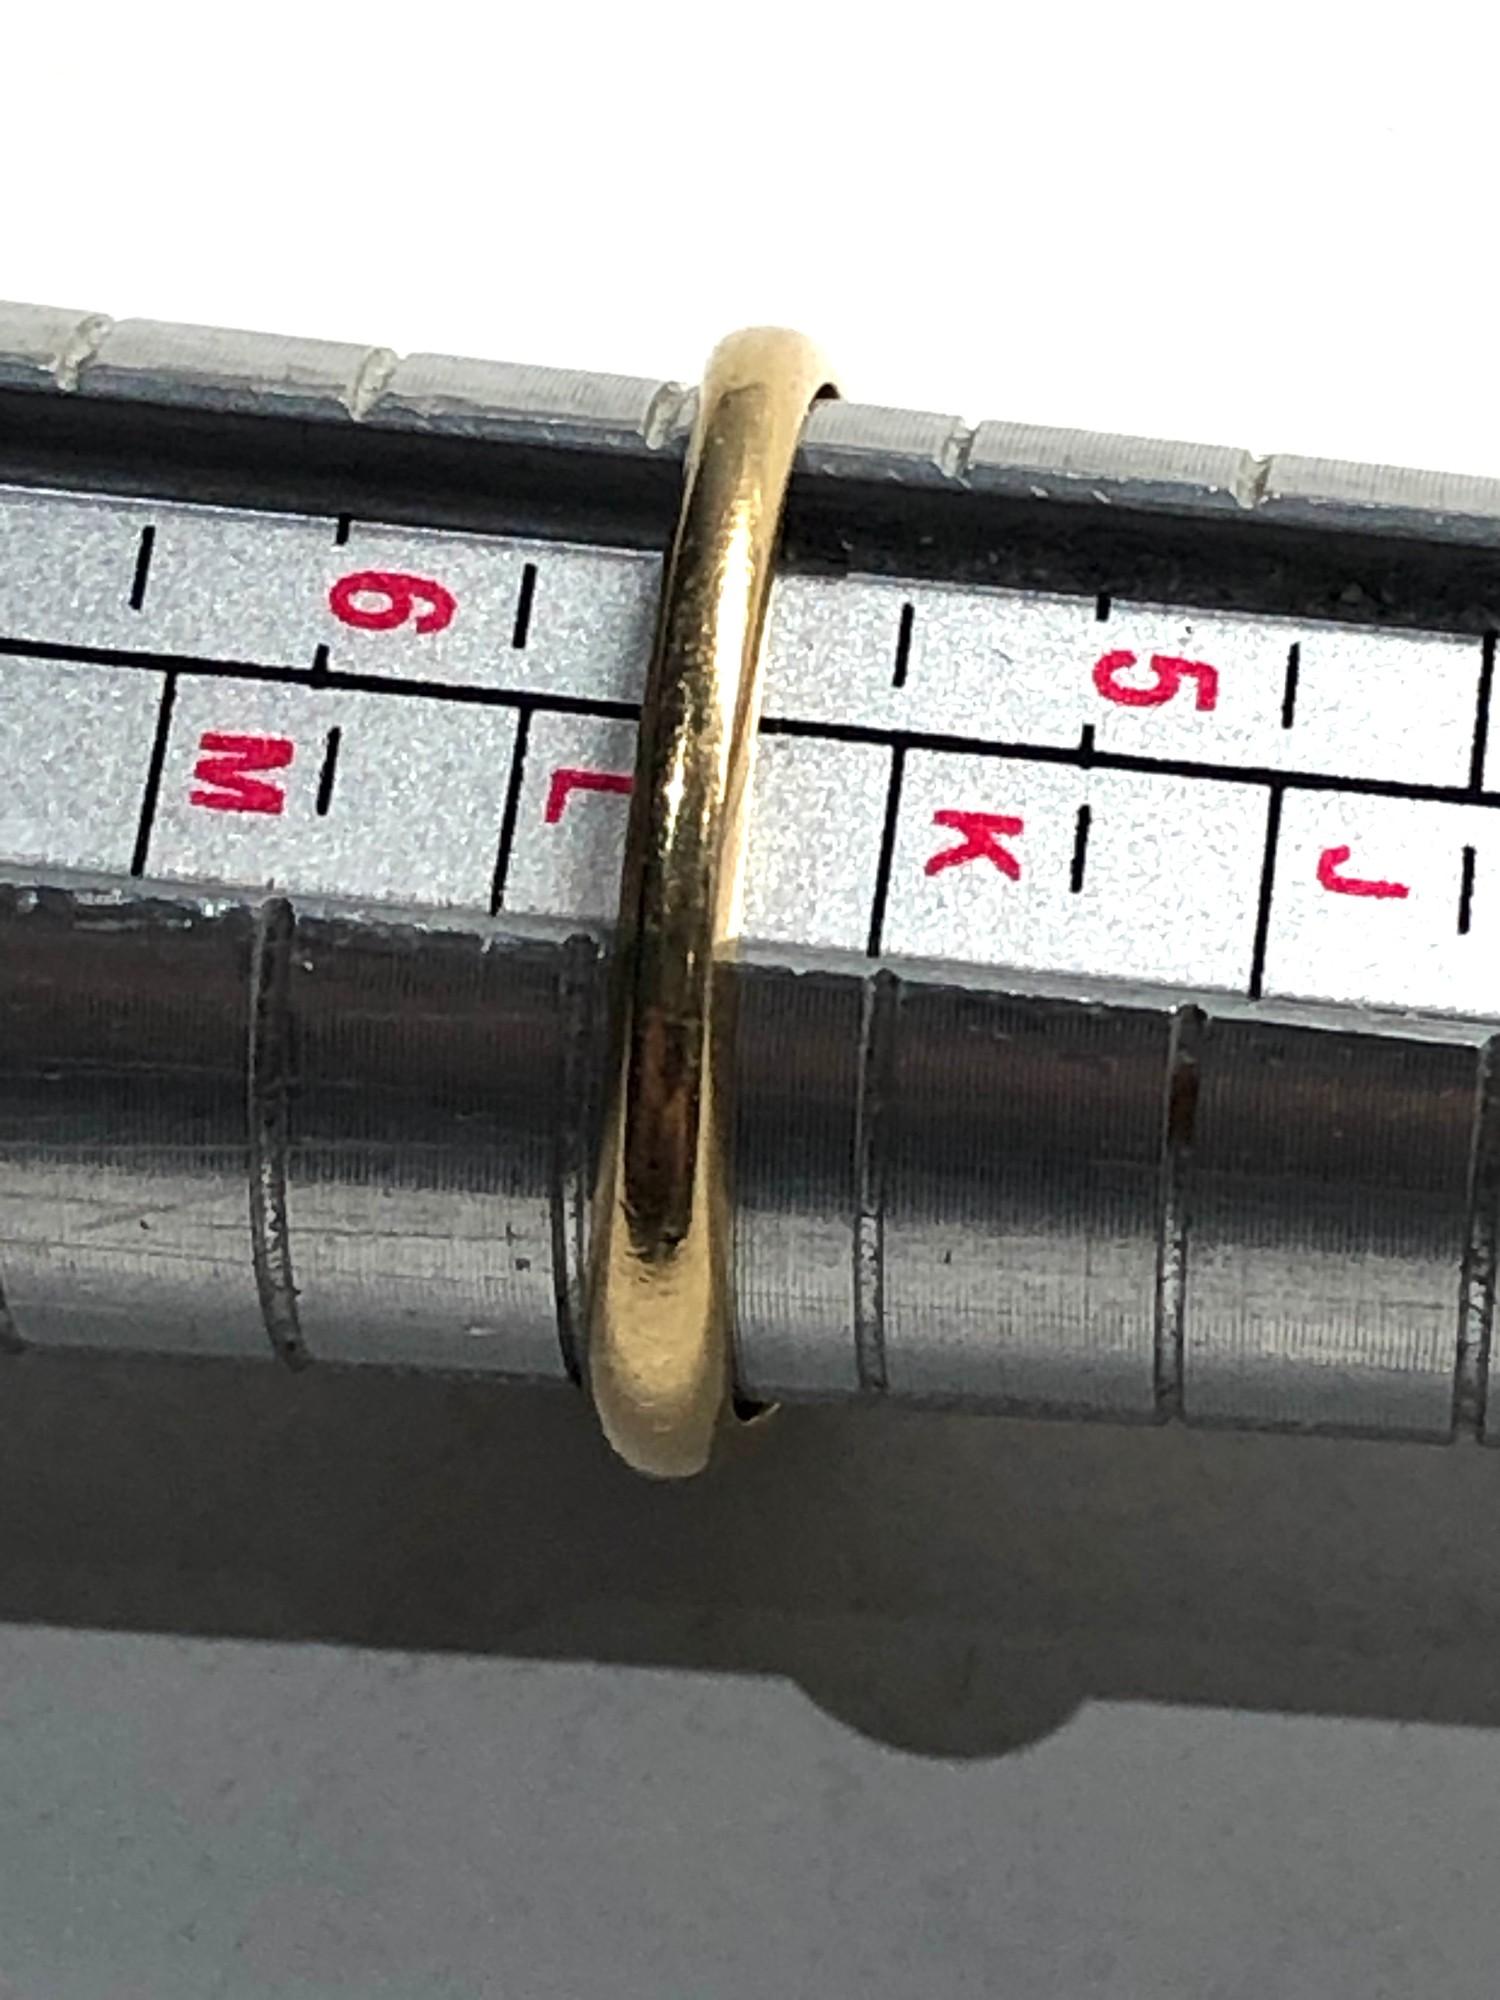 18ct vintage diamond five stone ring 2.4g - Image 3 of 3